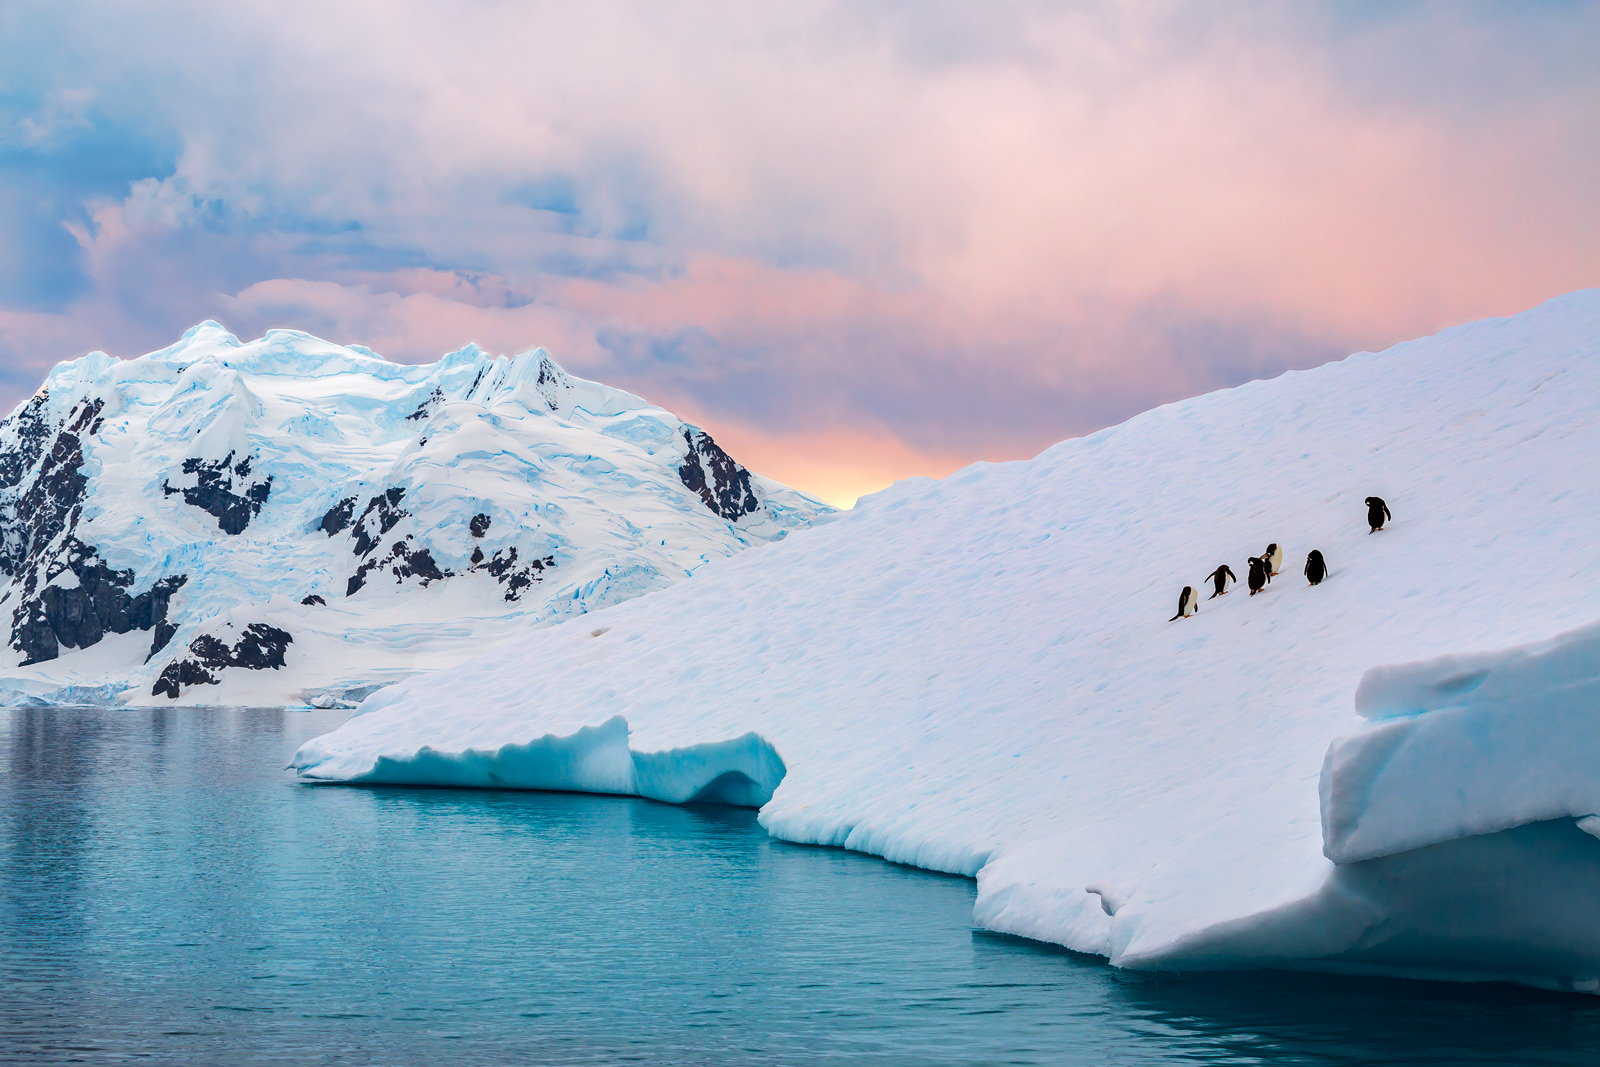 photo of penguins on iceberg in Antarctica